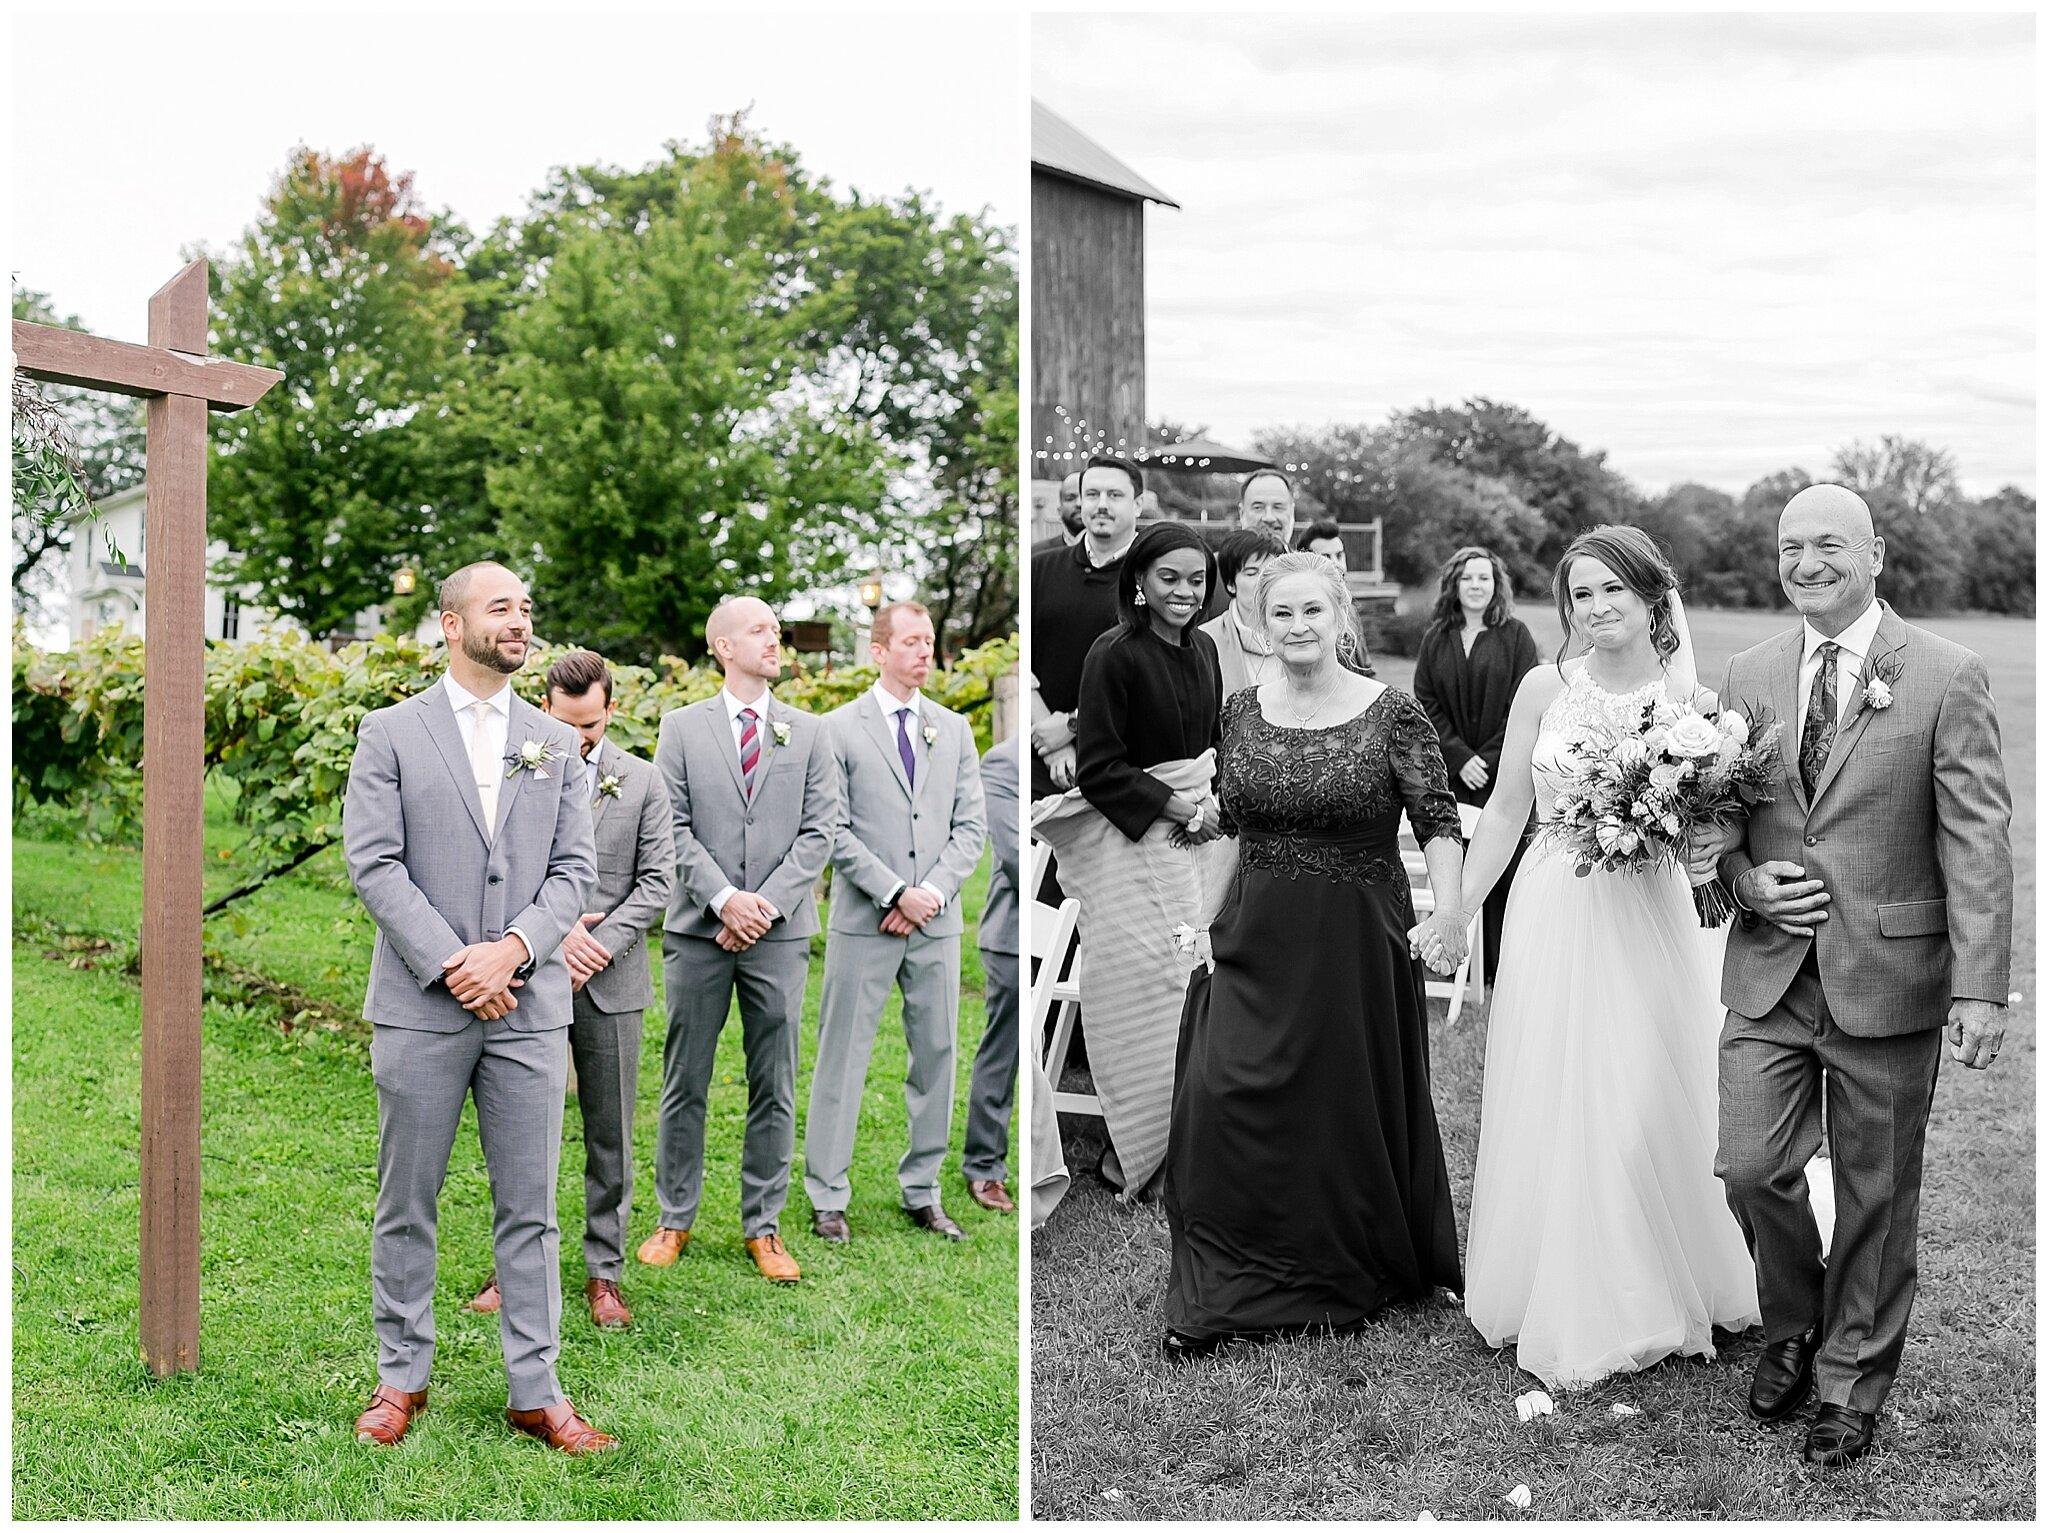 over_the_vines_edgerton_wisconsin_wedding_madison_wisconsin_photographer_0450.jpg